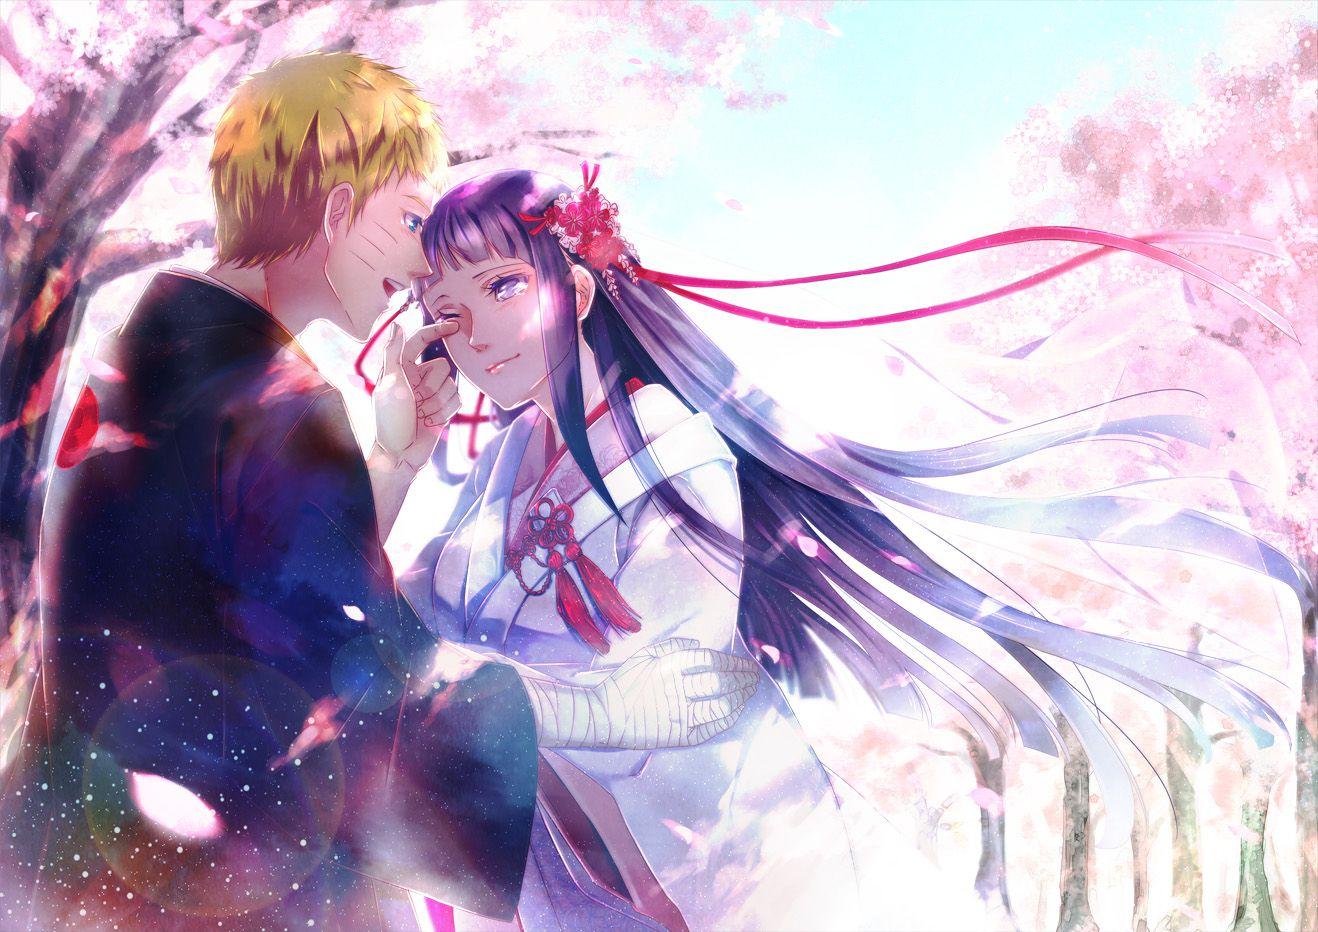 Naruto And Hinata Married Wallpaper Anime Wallpaper Pinterest